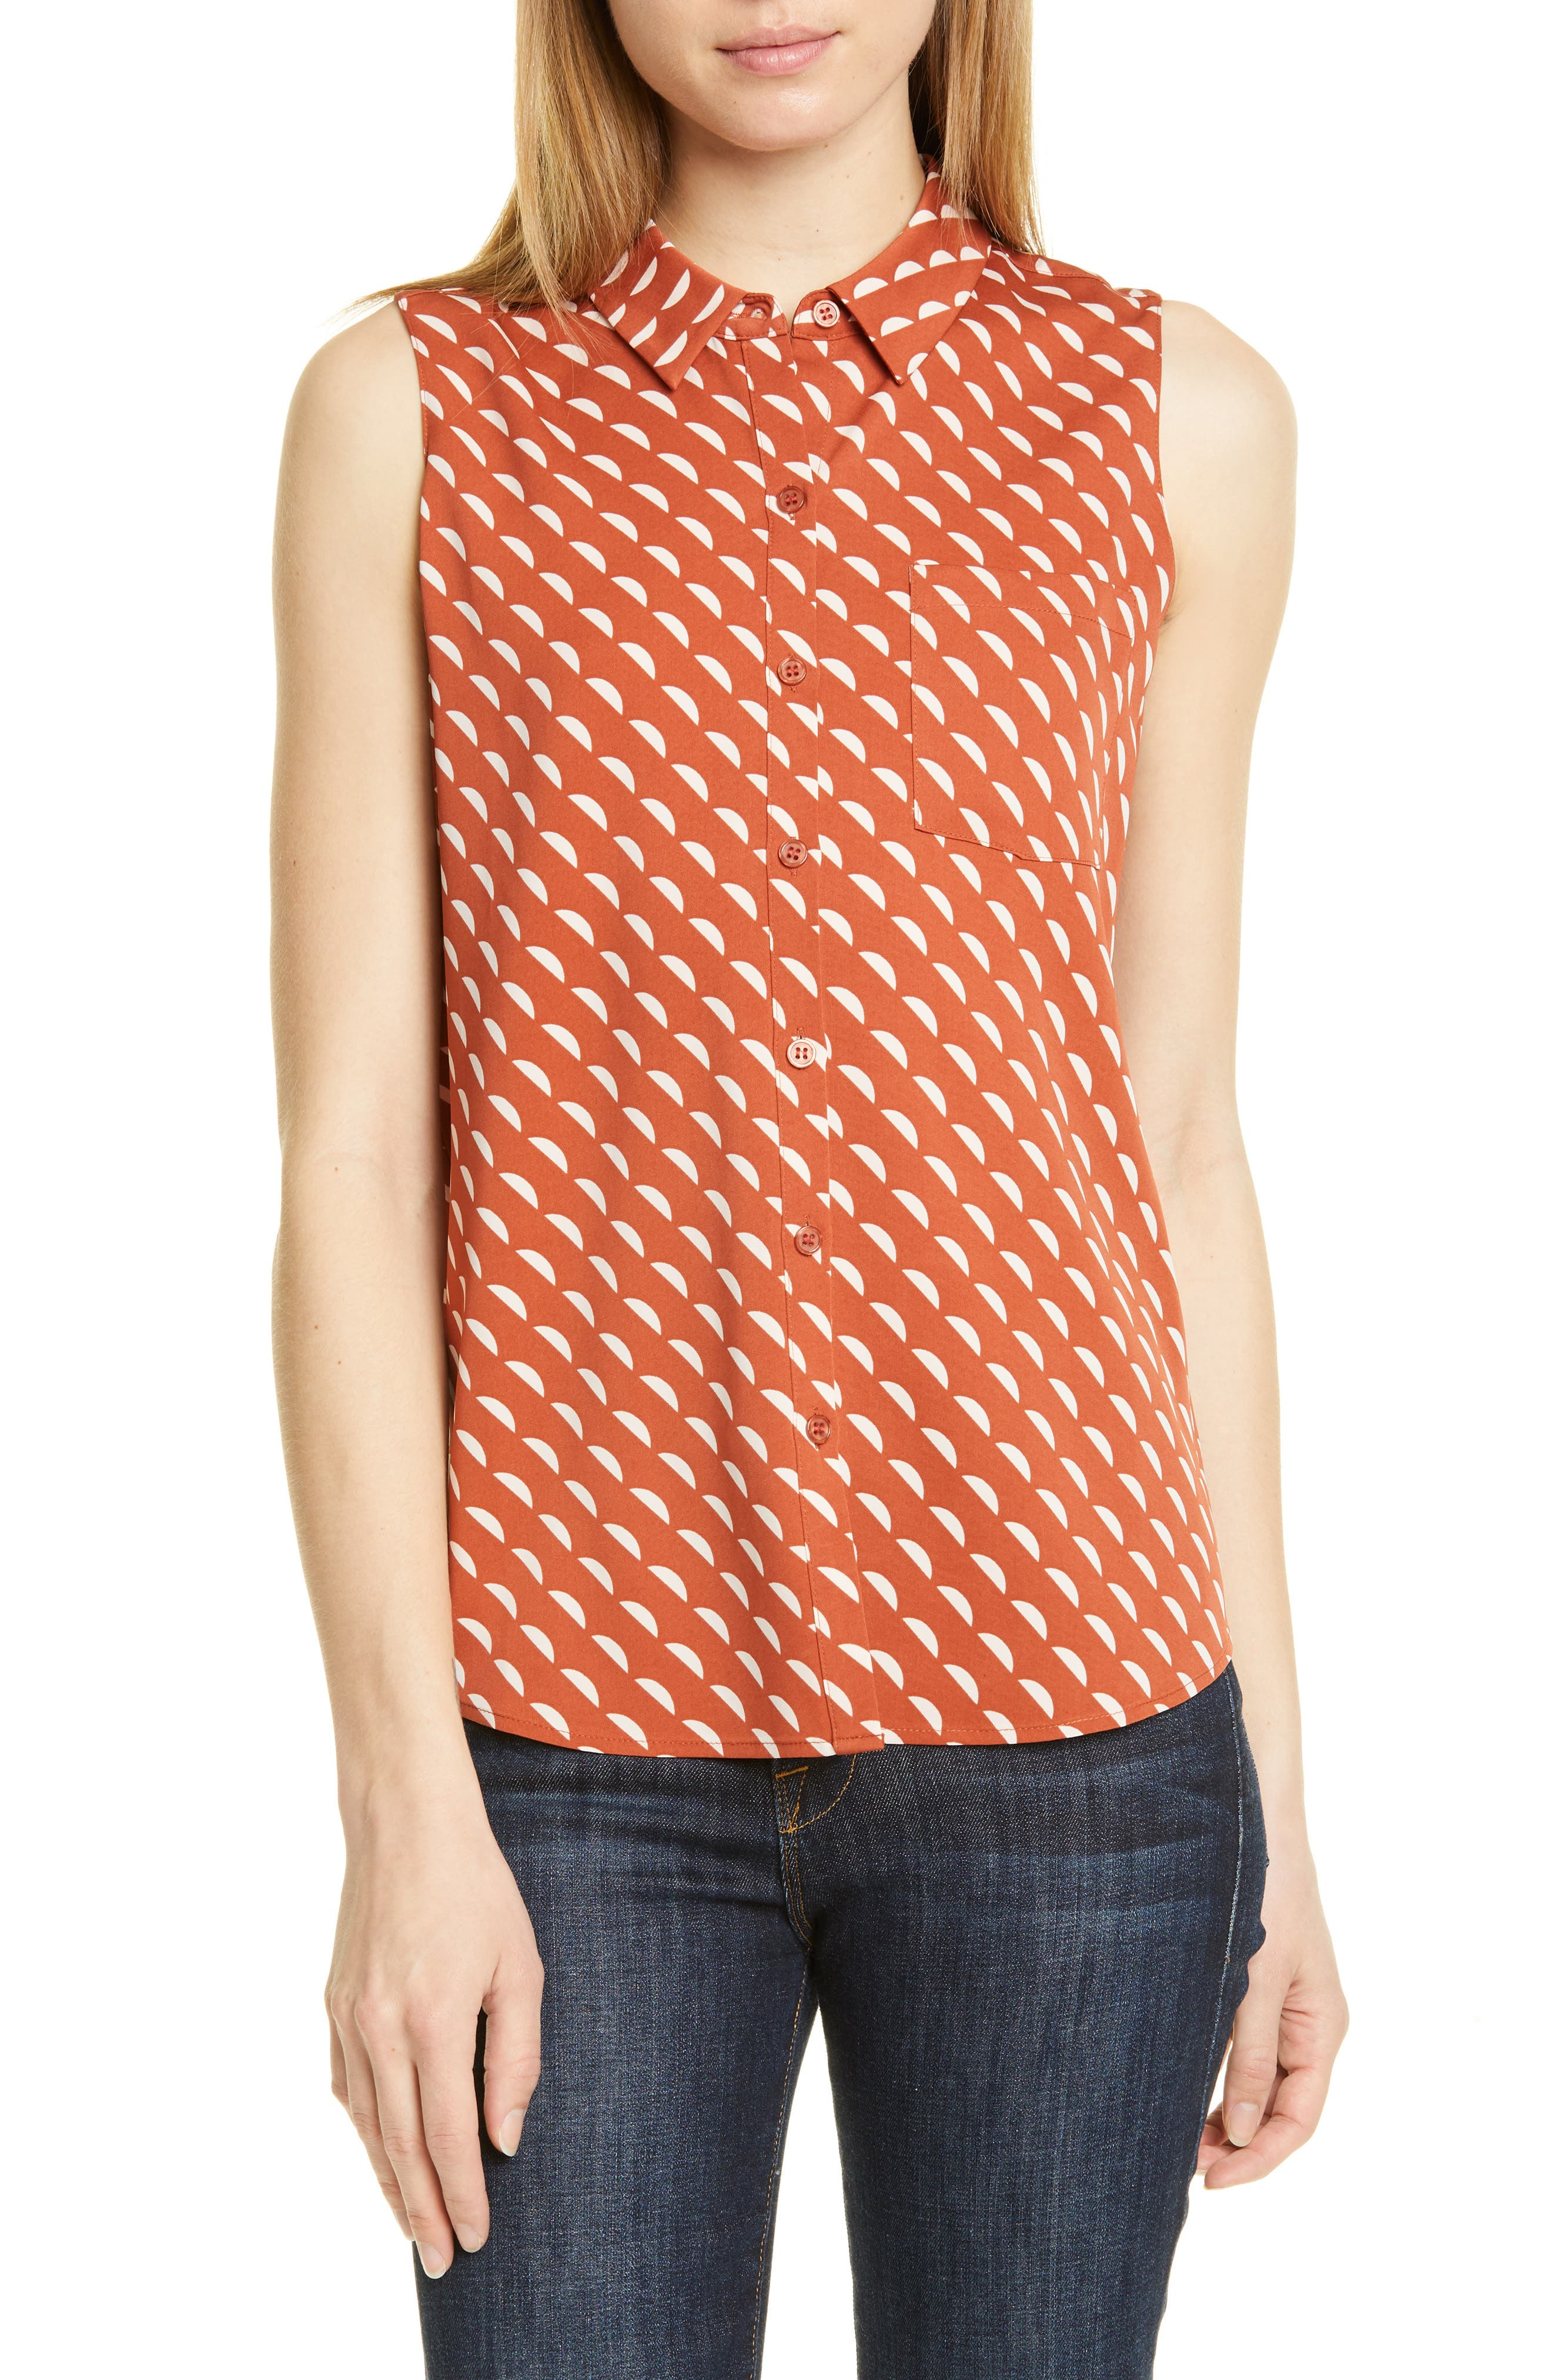 Nordstrom Signature Sleeveless Stretch Silk Shirt, Metallic